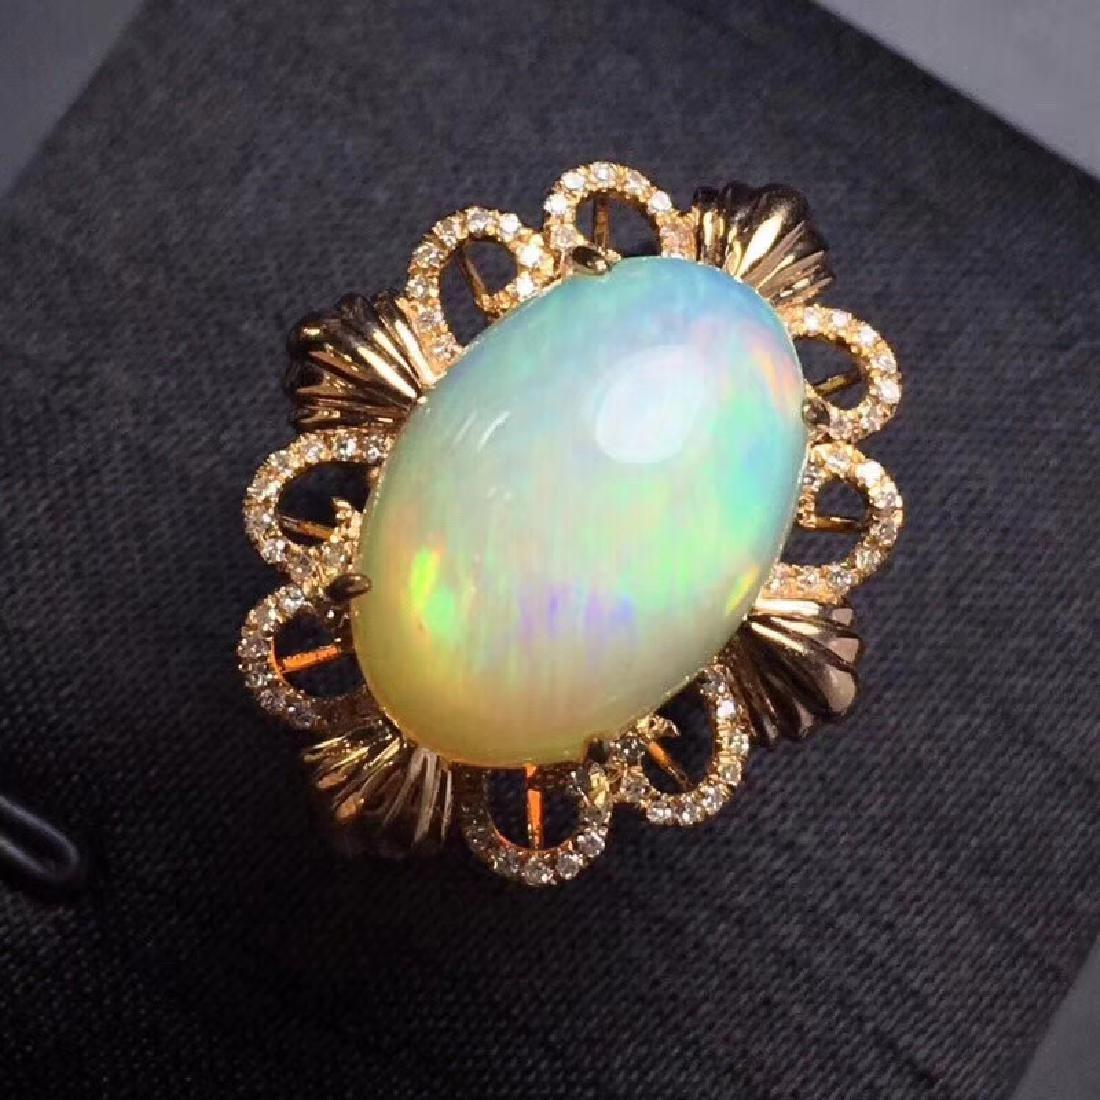 7.7 CTW Opal & VS Diamond Ring 18K - 2